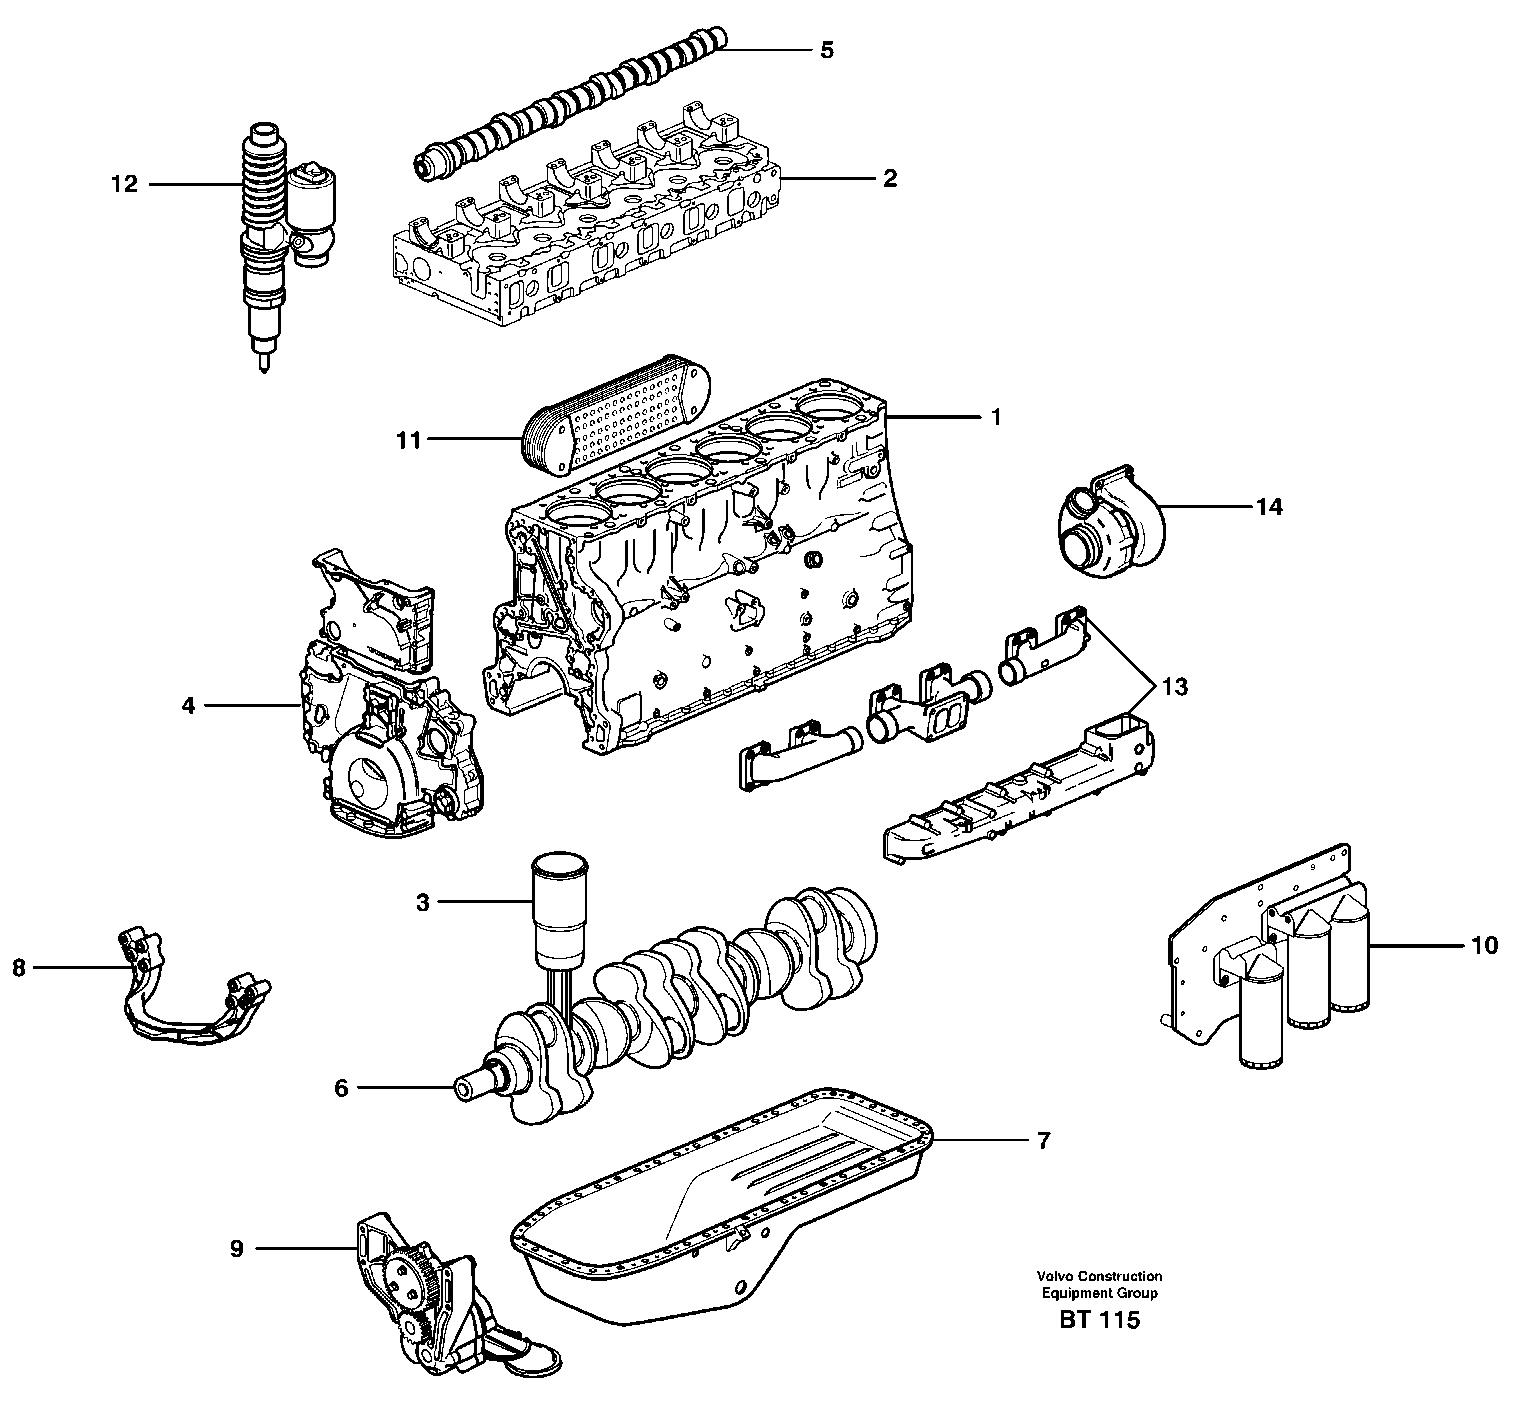 kaya-kamyonu-motor